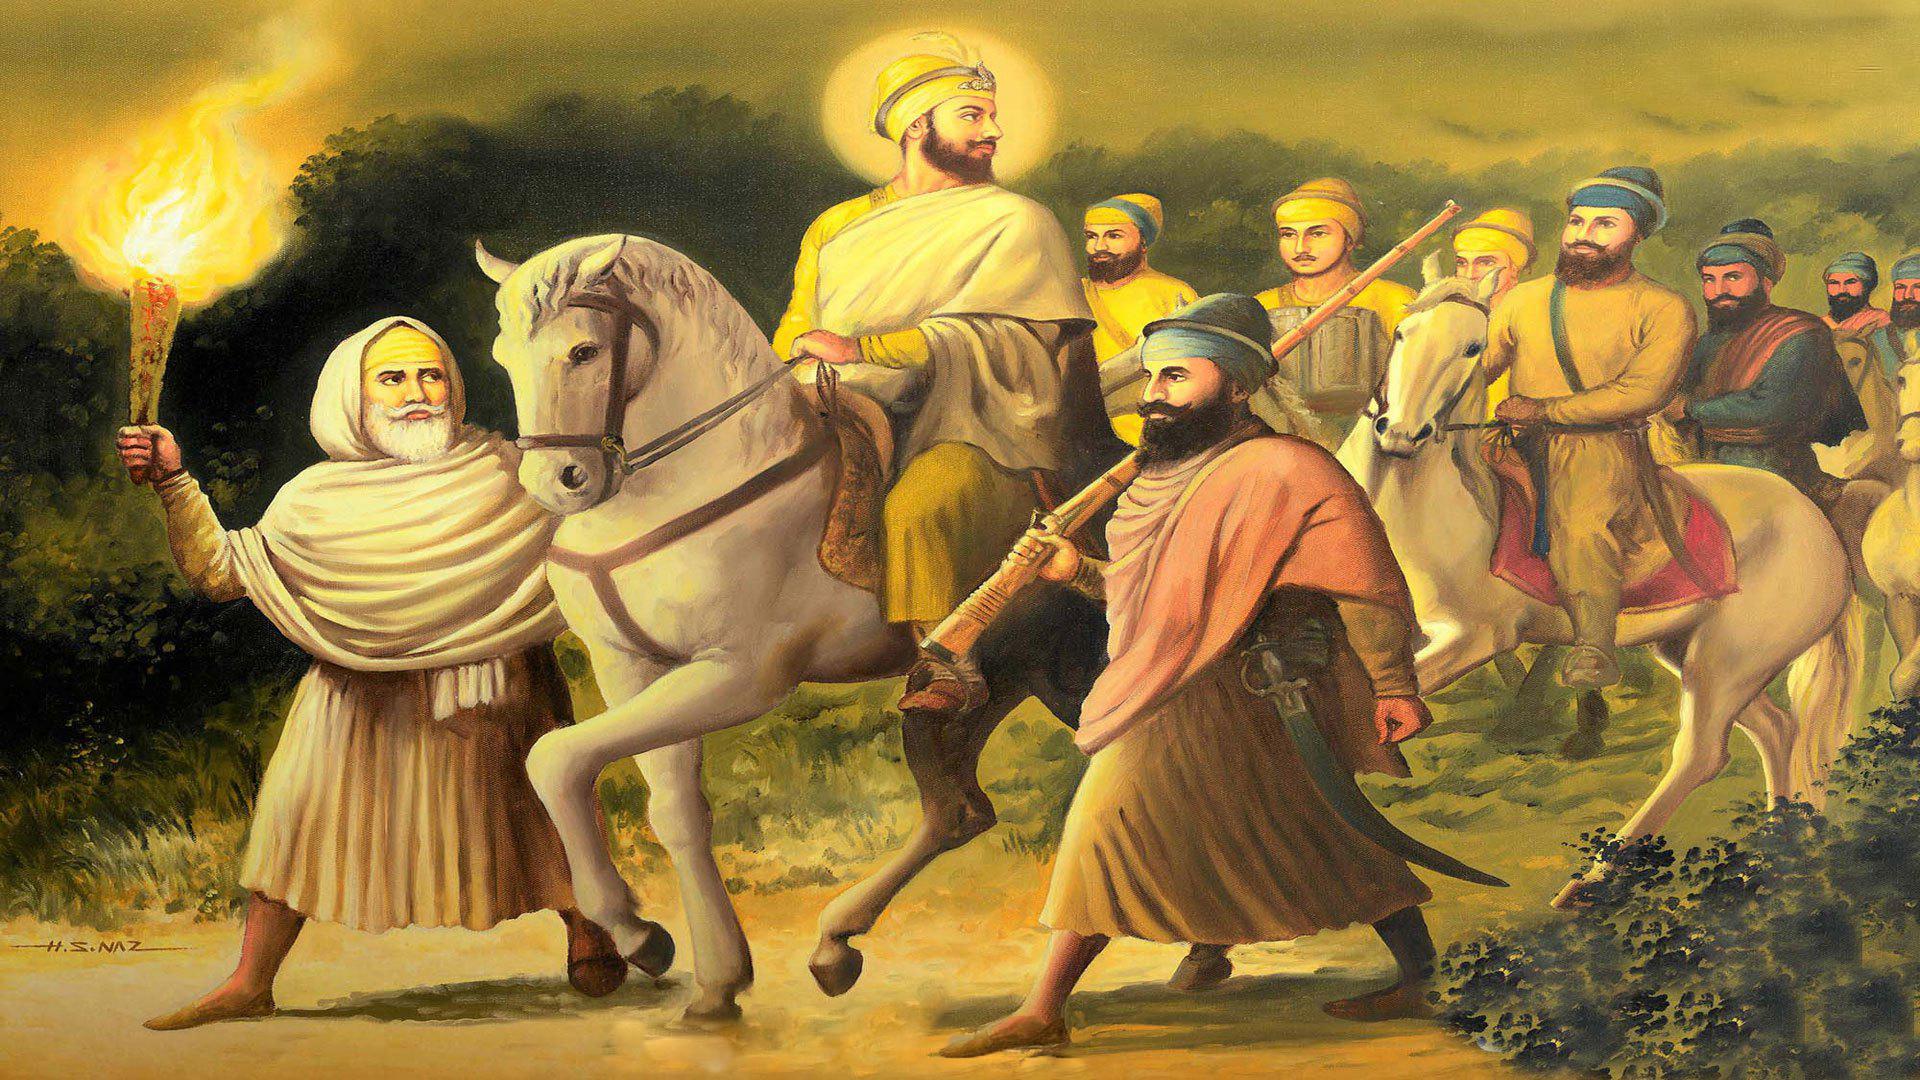 Images Of Guru Gobind Singh Ji With Chaar Sahibzaade